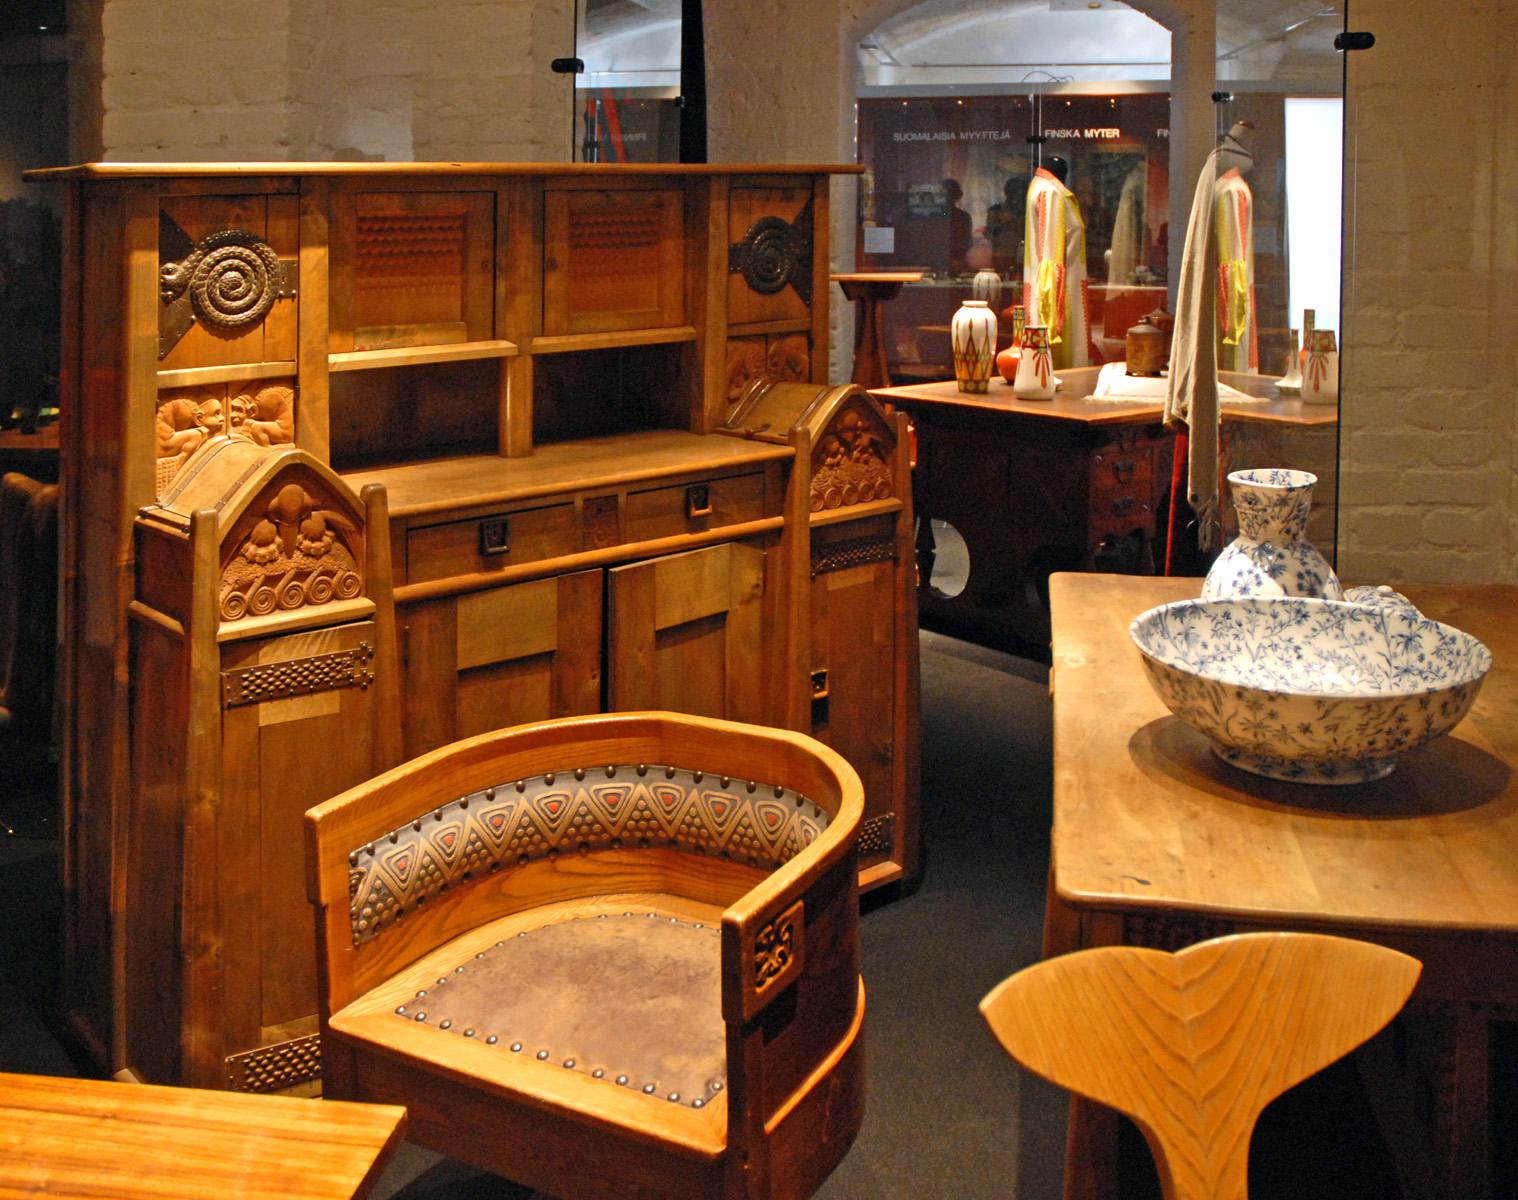 file mobilier art nouveau finlandais mus e du design helsinki 2765671356 jpg wikimedia. Black Bedroom Furniture Sets. Home Design Ideas